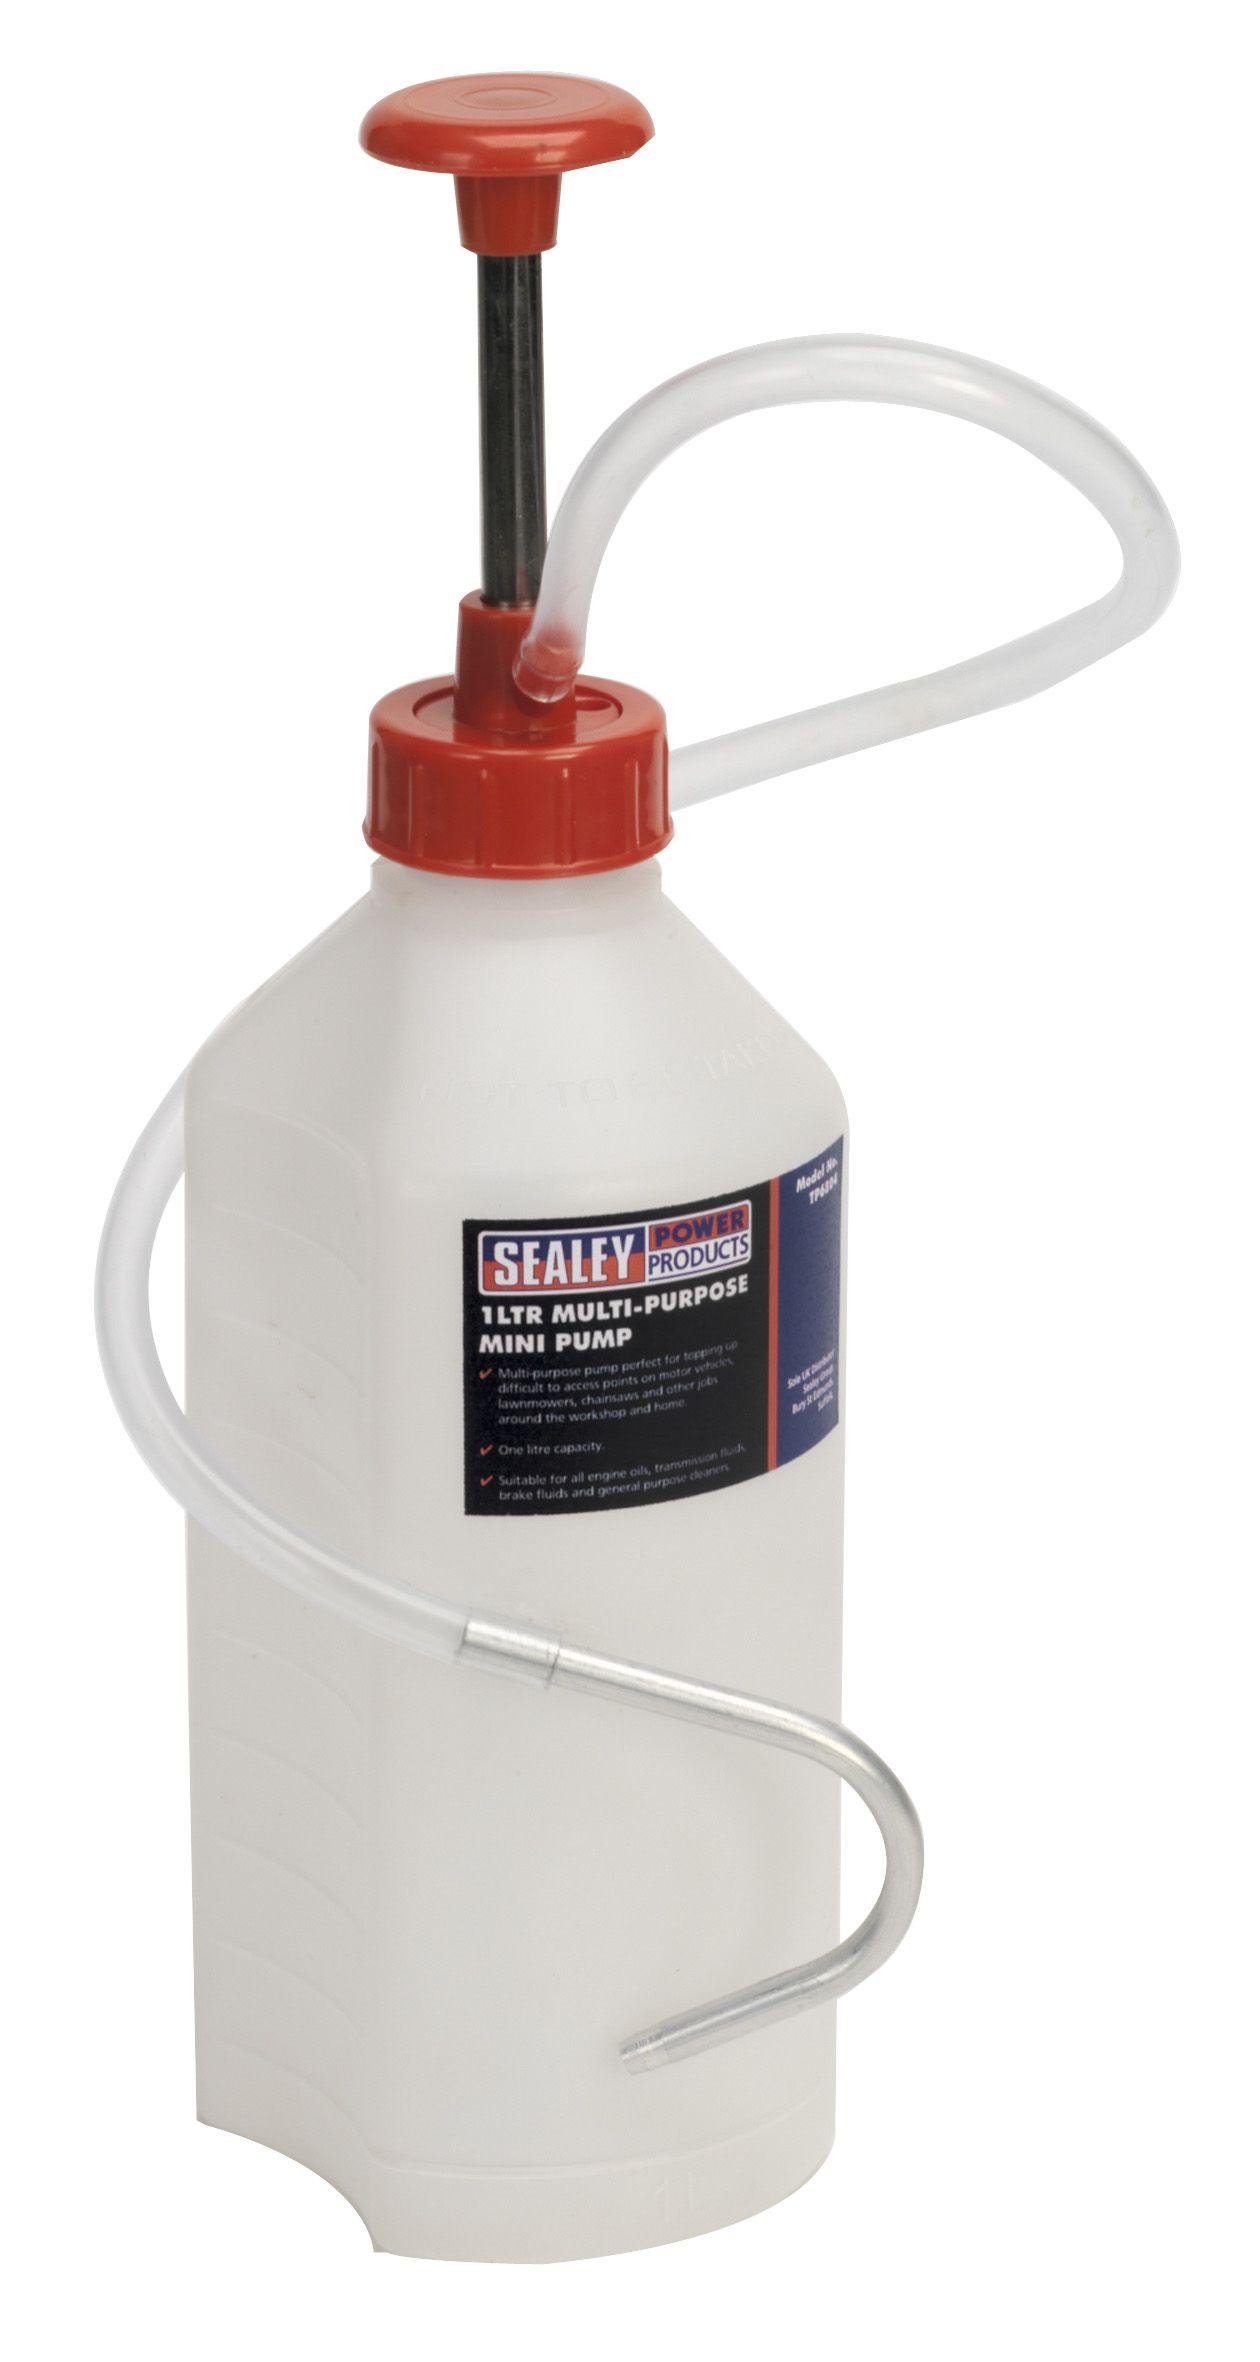 Sealey Multipurpose Mini Pump 1L